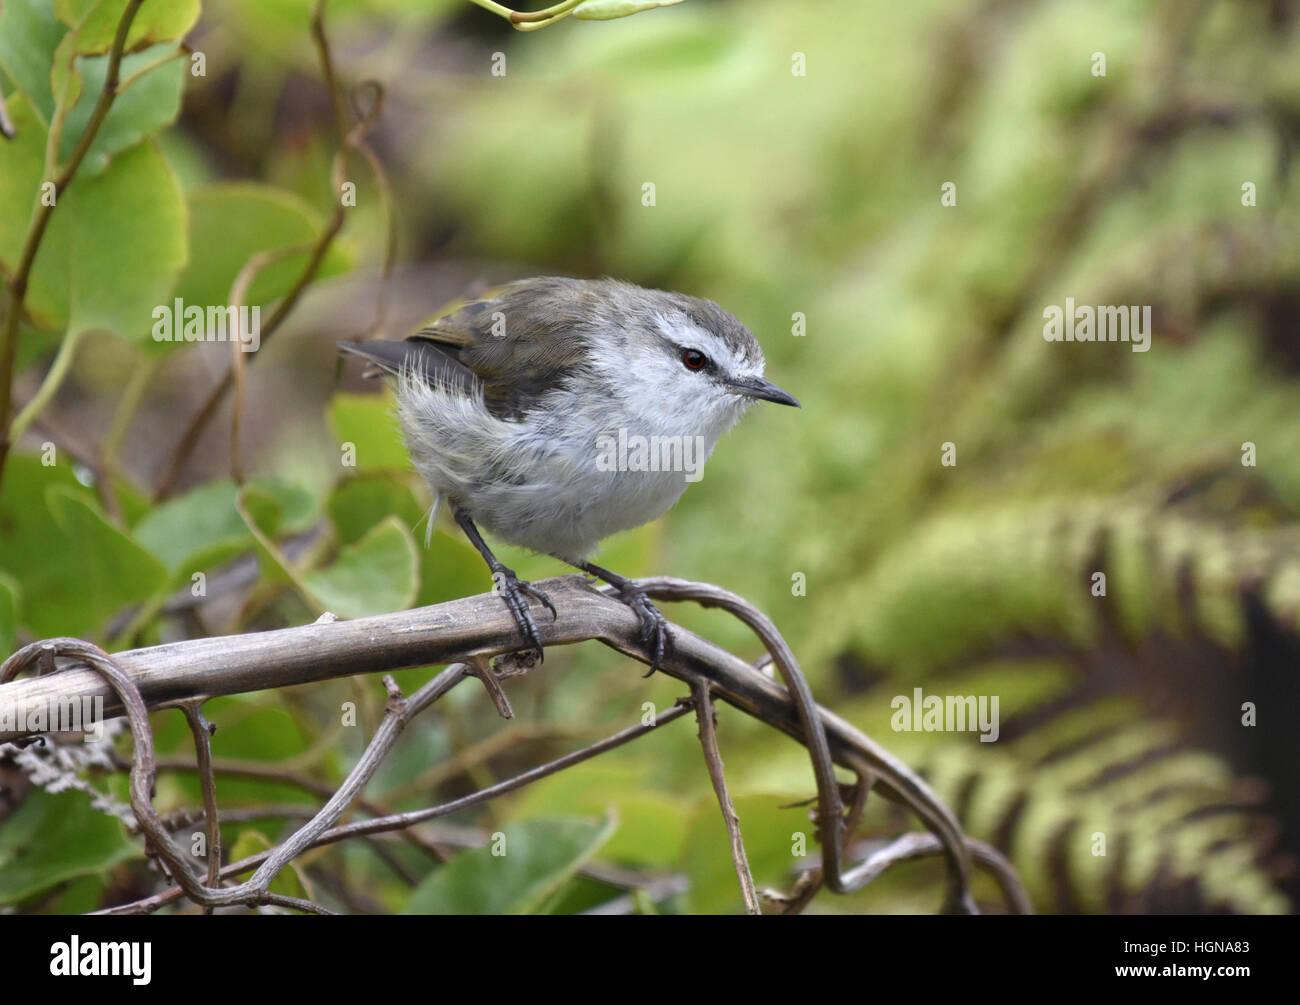 Chatham-Inseln Warbler - Gerygone albofrontata Stockbild